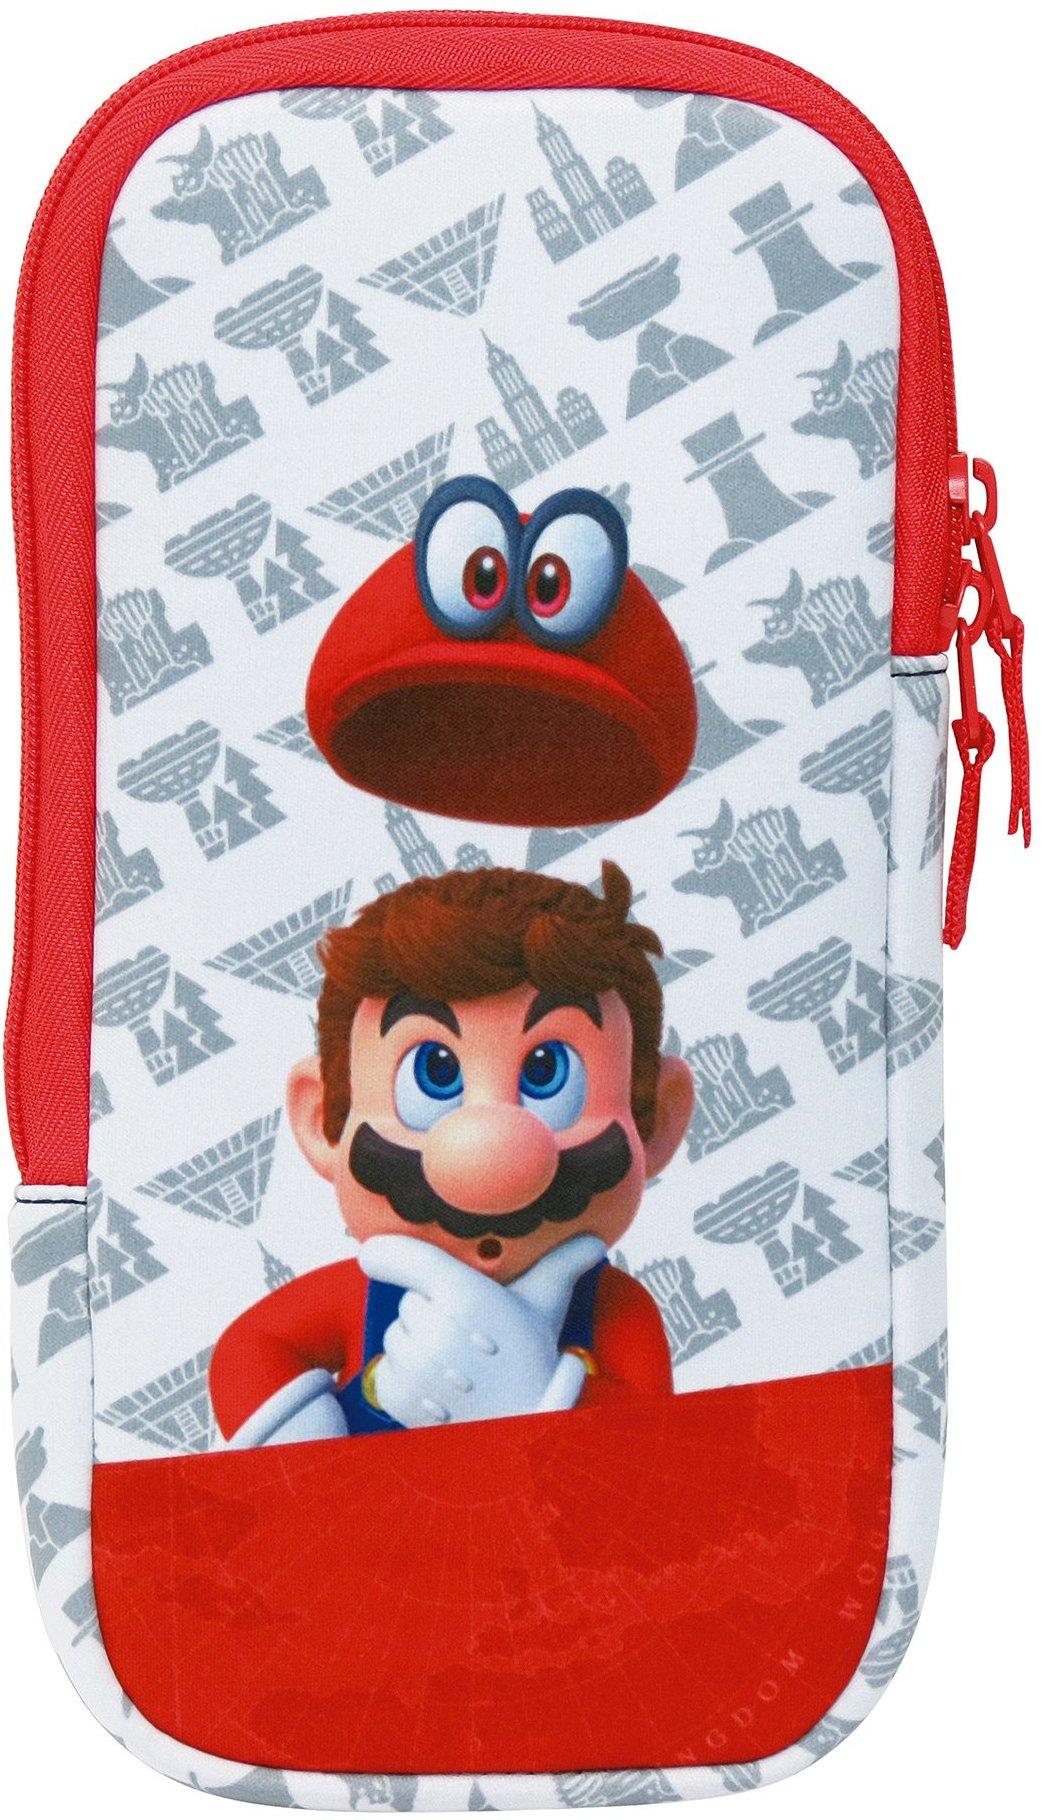 HORI Preparing A Super Mario Odyssey Accessory Set For Switch Nintendo Everything